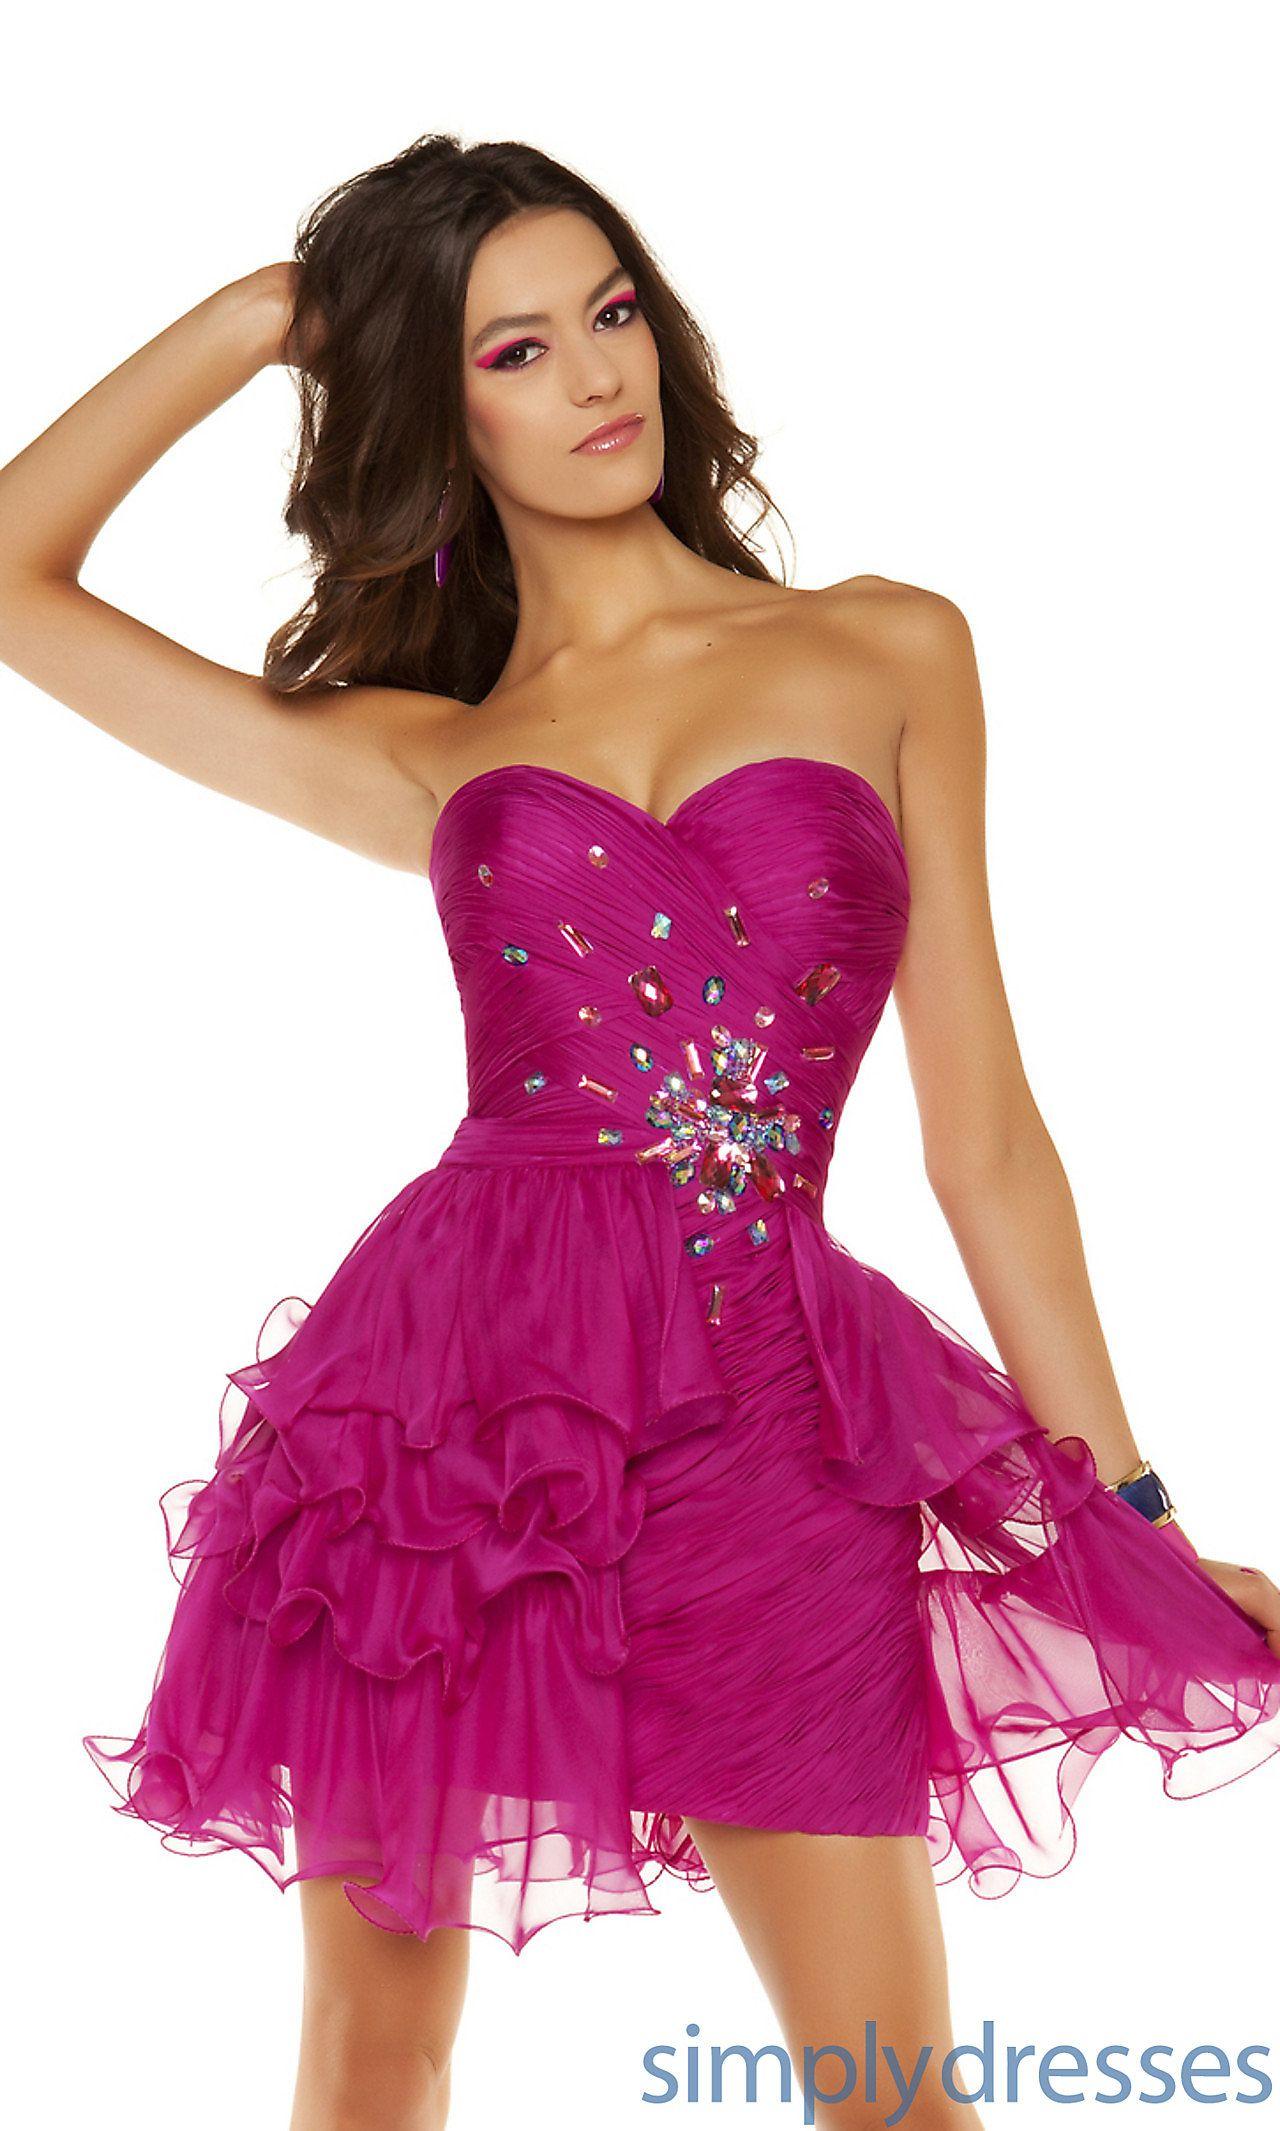 Short Strapless Ruched Dress CS-MD-6442N | Women\'s Fashion that I ...